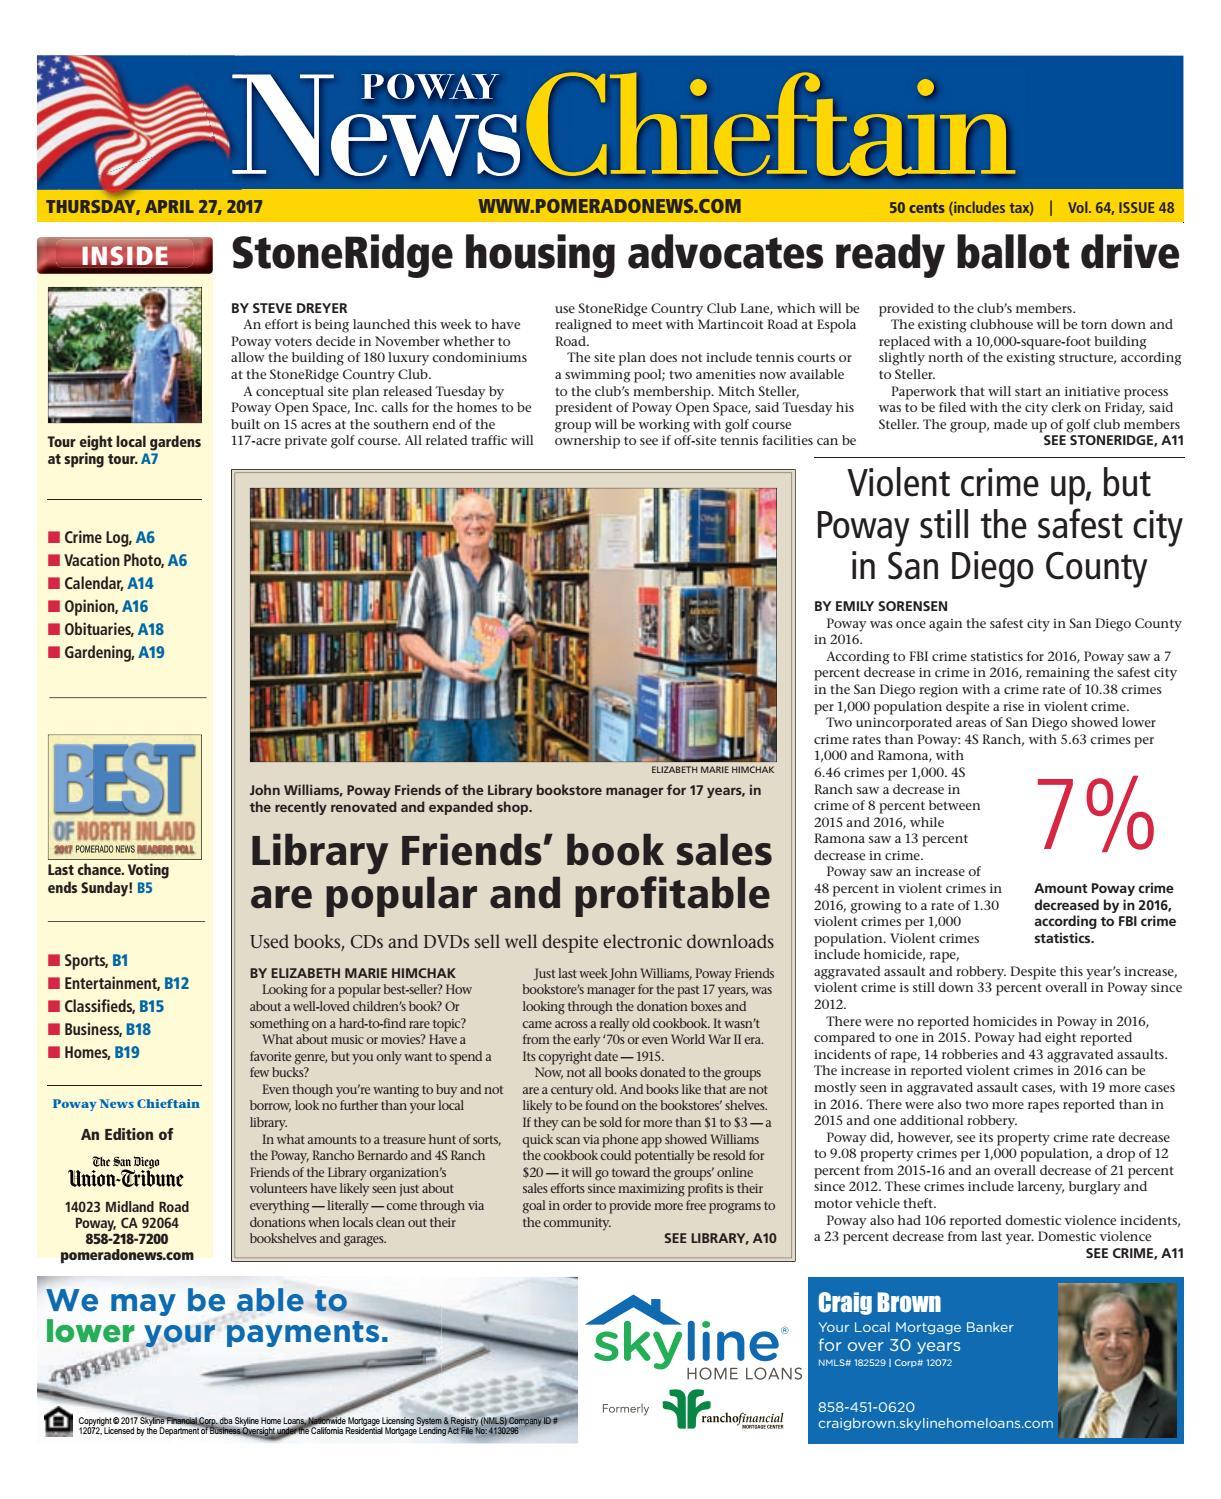 Poway news chieftain 04 27 17 by MainStreet Media - issuu